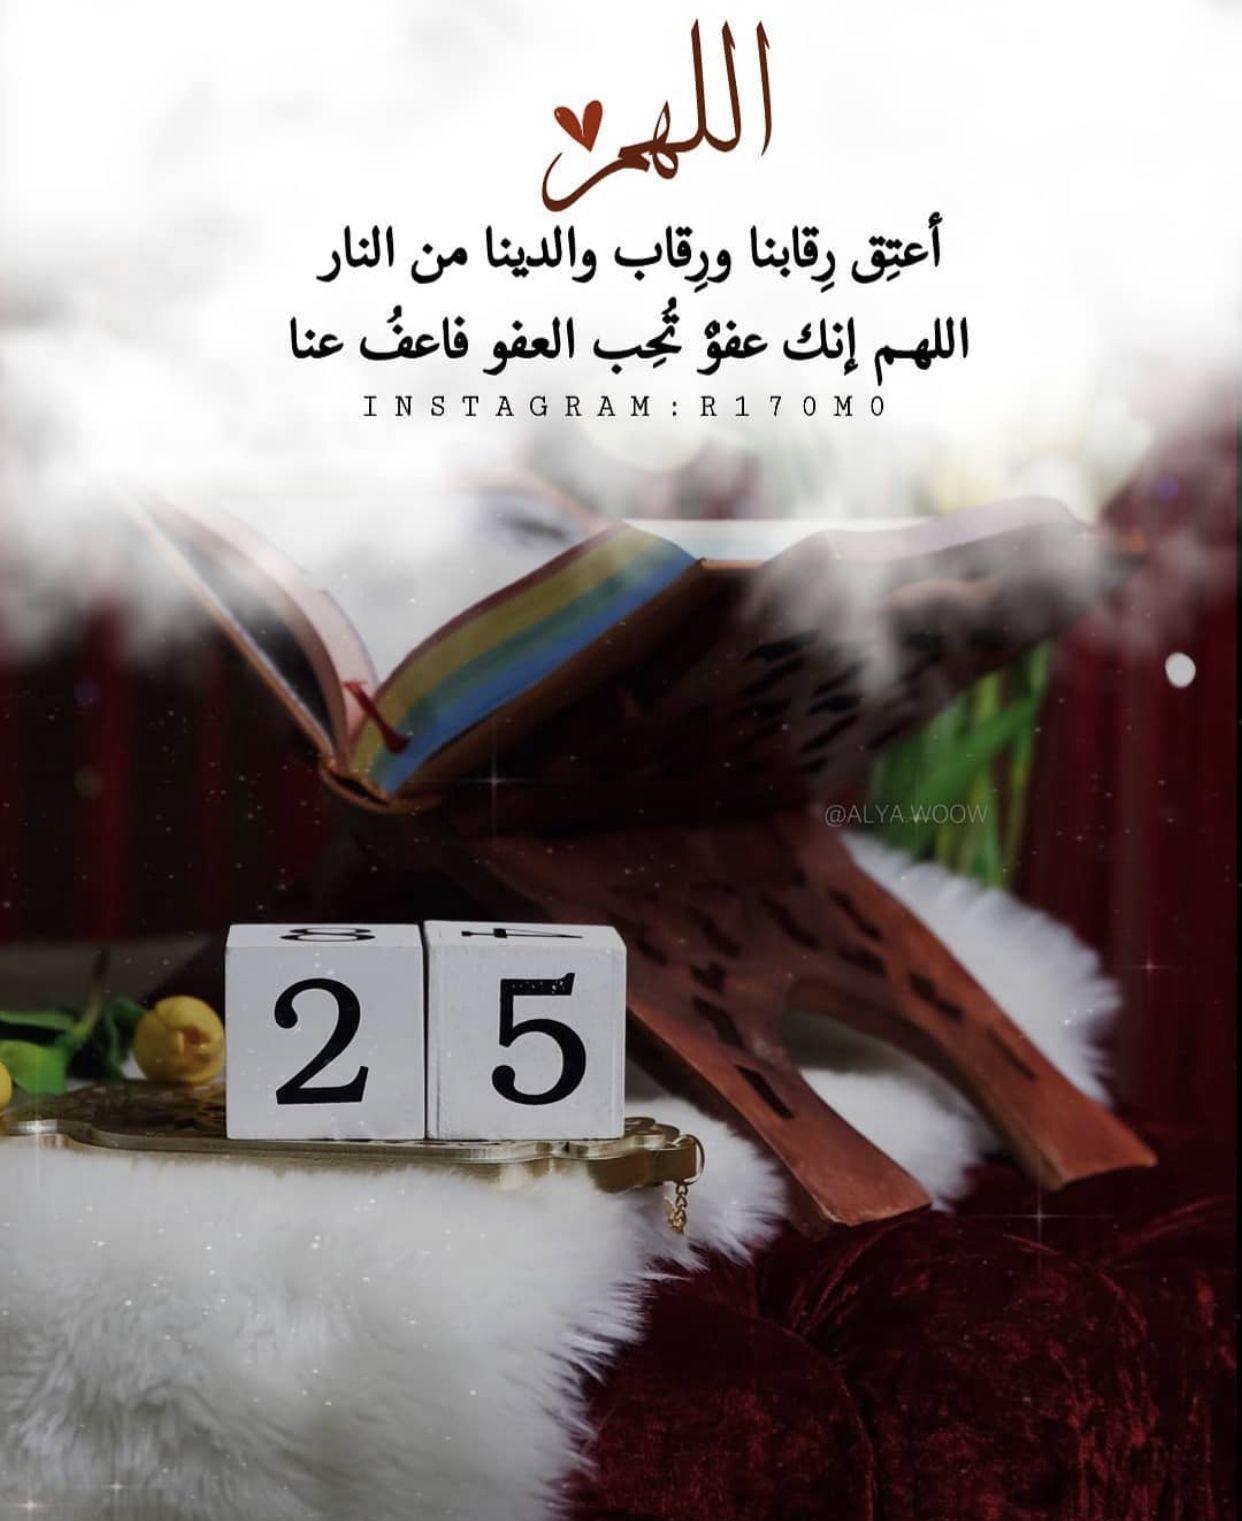 Pin By Shadiah Turkustani On ٢٠ رمضان In 2020 Ramadan Ramadan Kareem Instagram